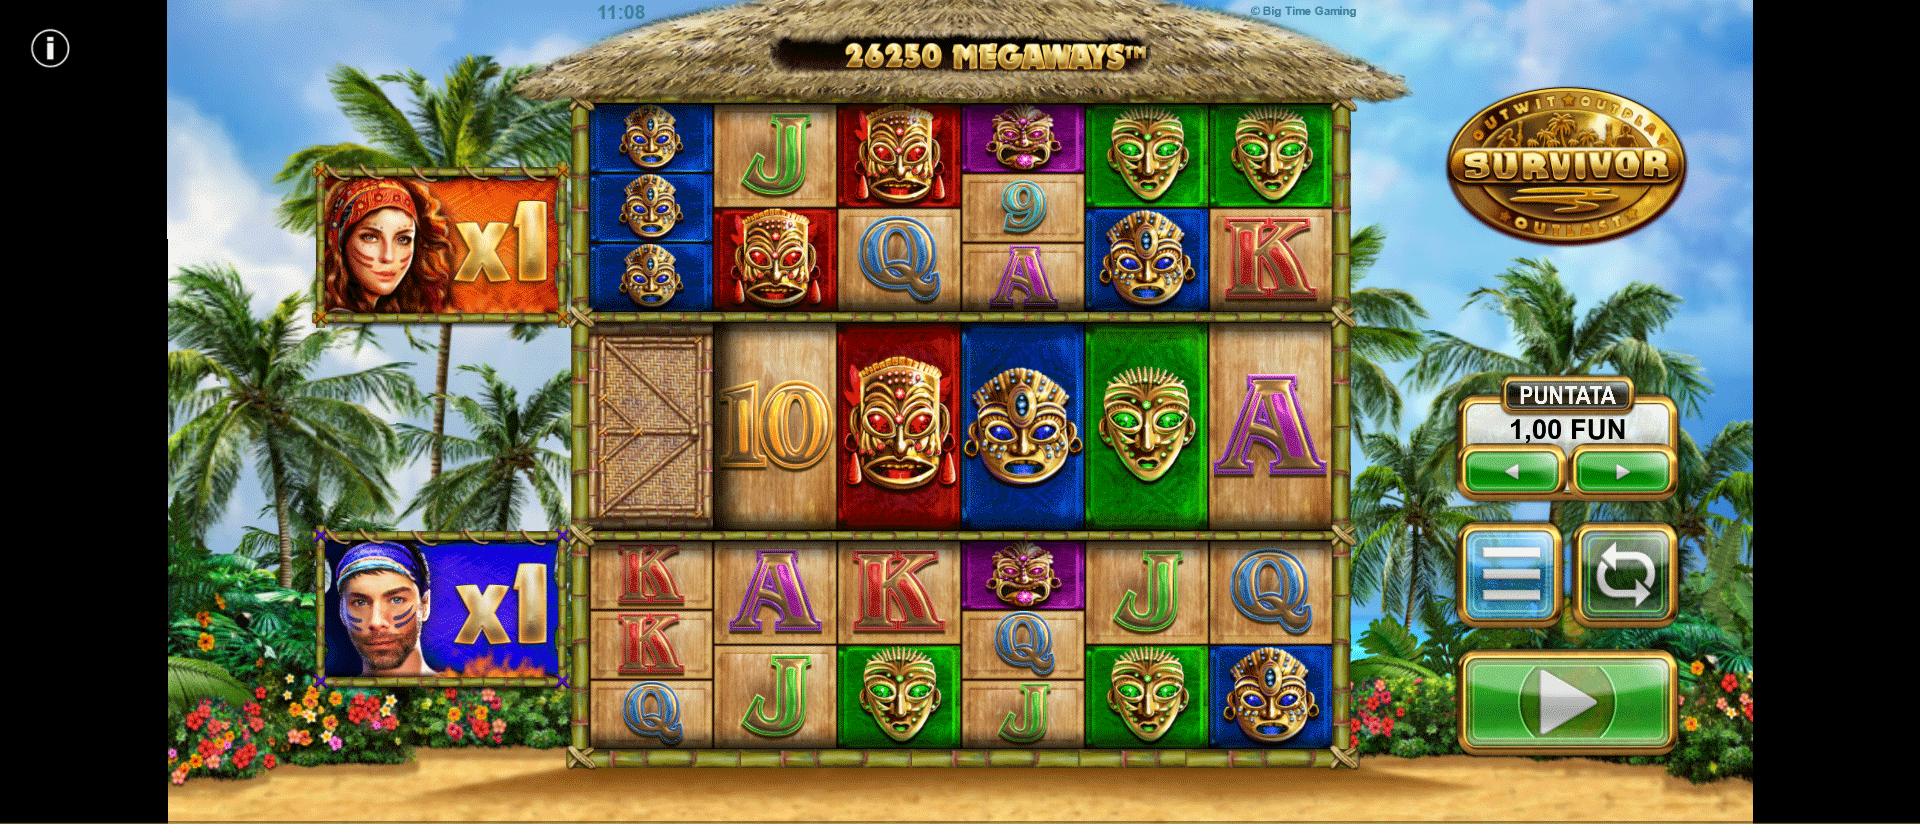 Slot Survivor Megaways